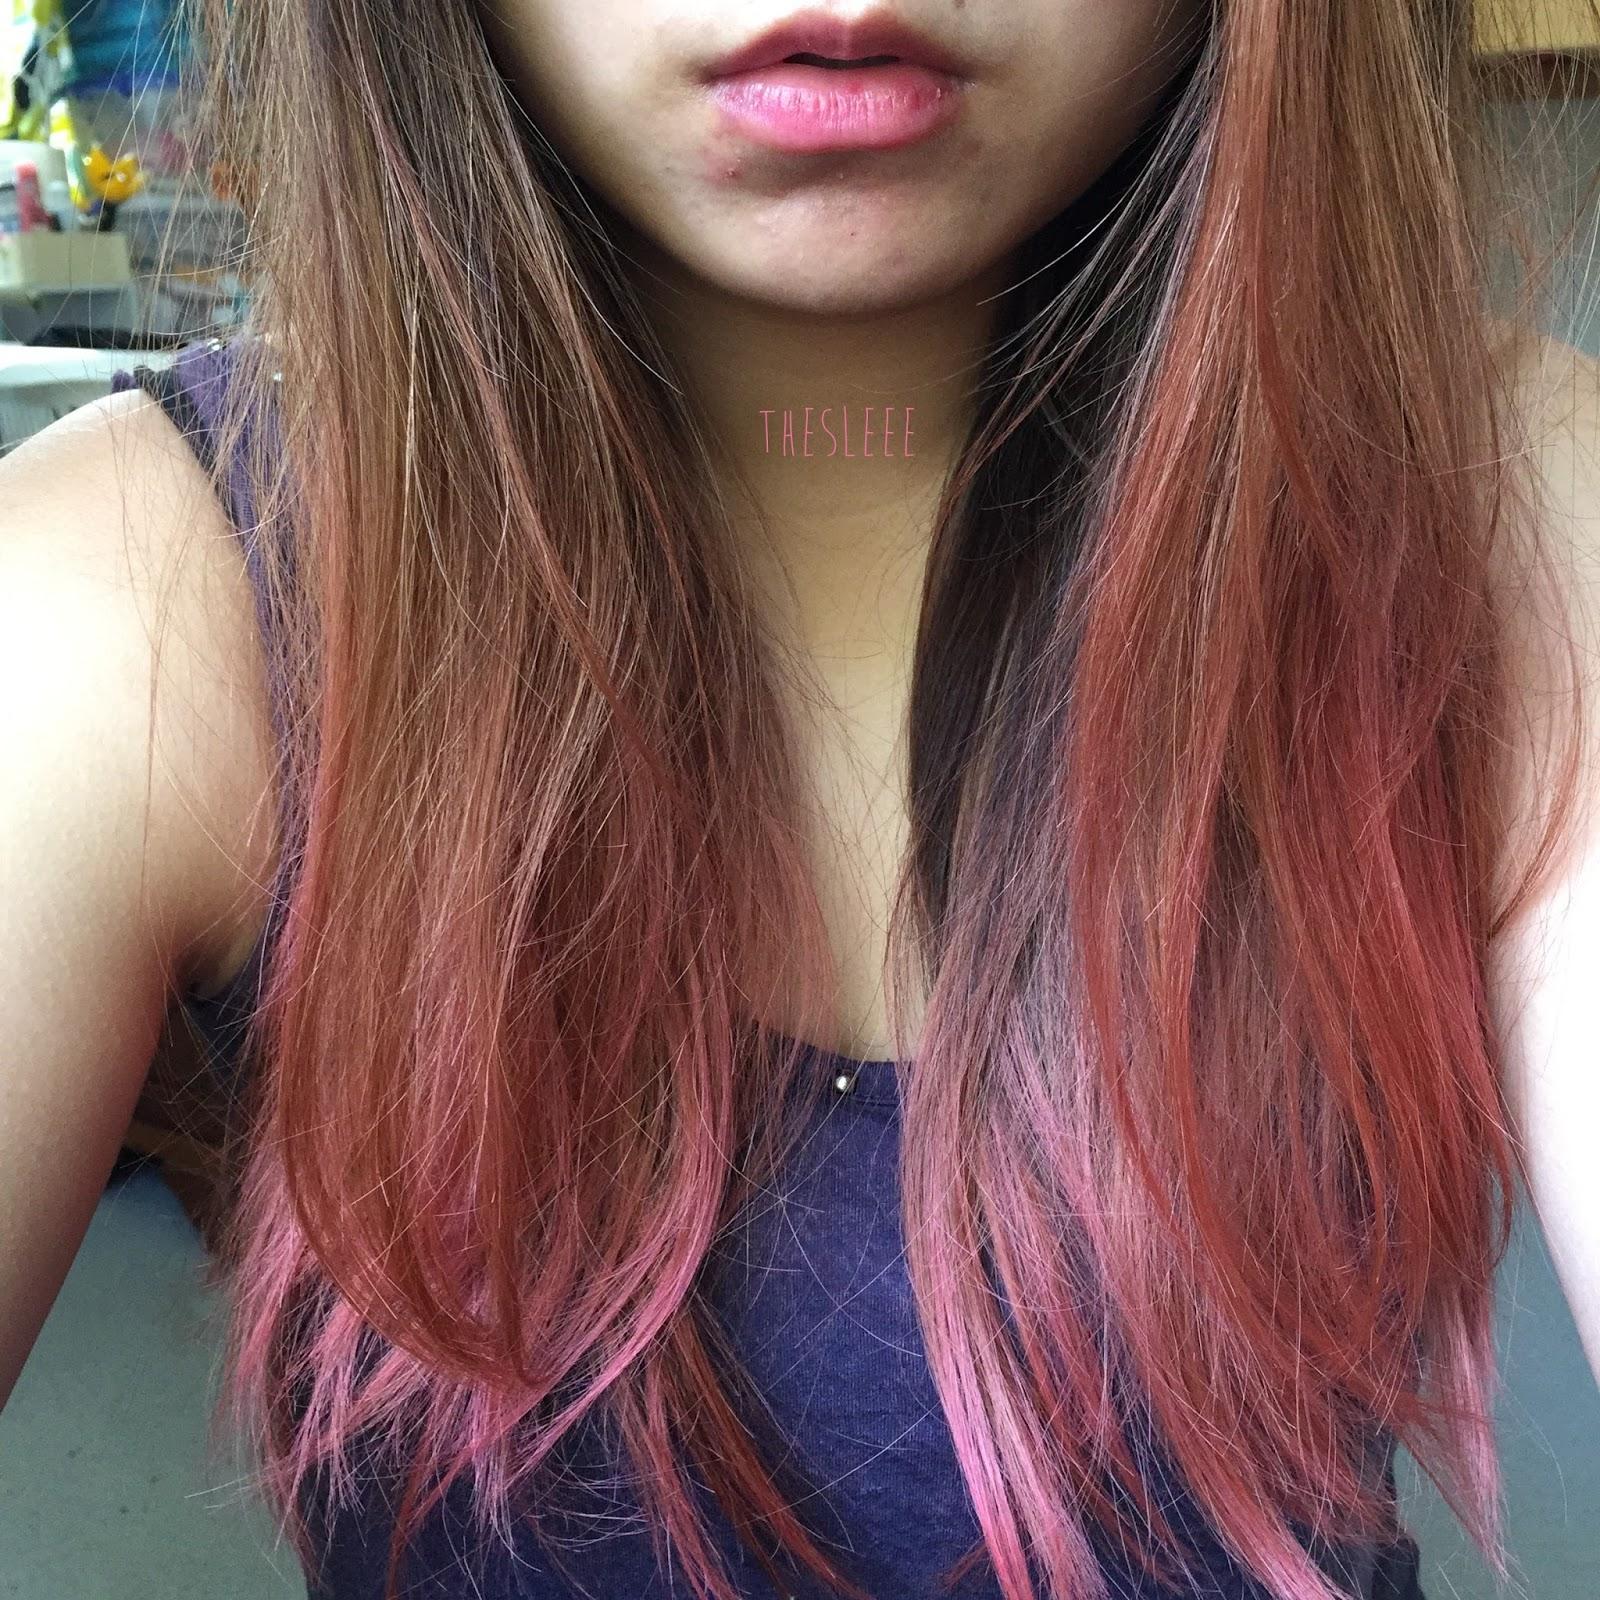 The Sleee Review Brite Organix Semi Permanent Pastel Pink